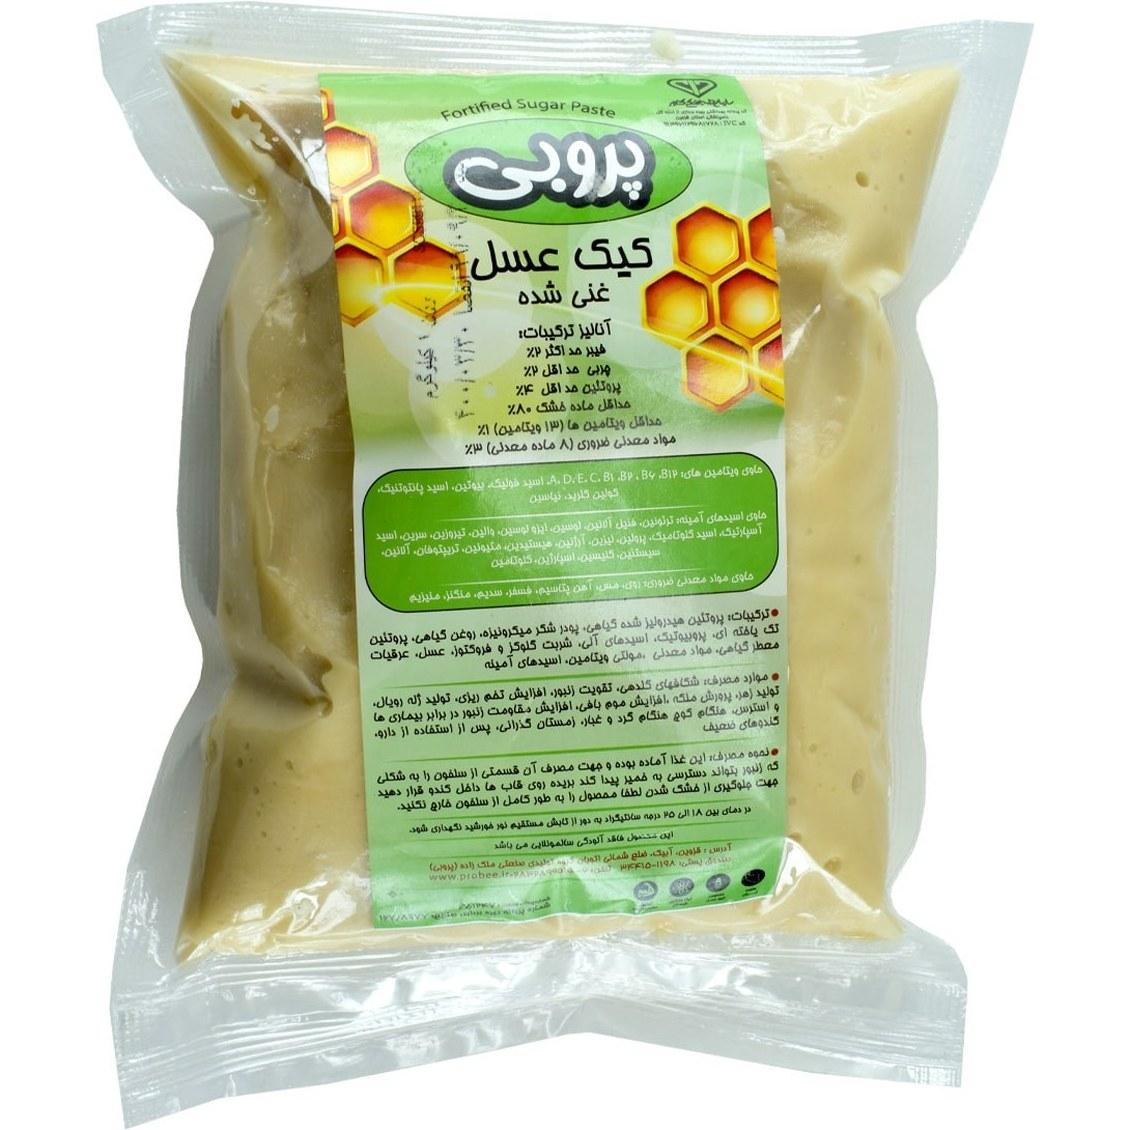 کیک عسل پروبی بسته 1 کیلوگرمی